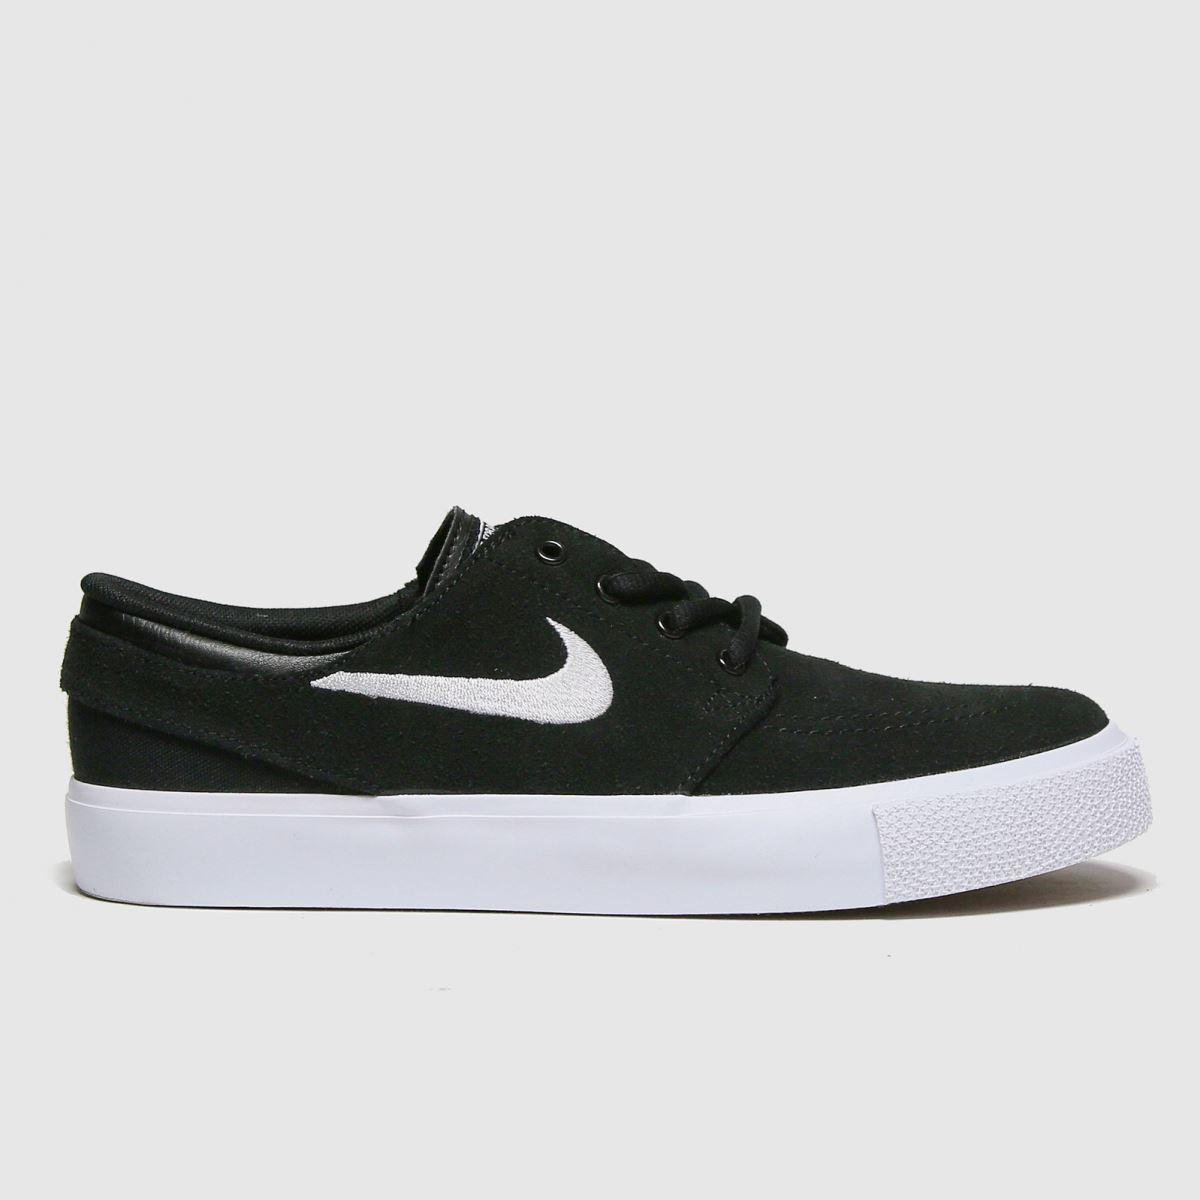 Nike SB Nike SB Black & White Stefan Janoski Trainers Youth